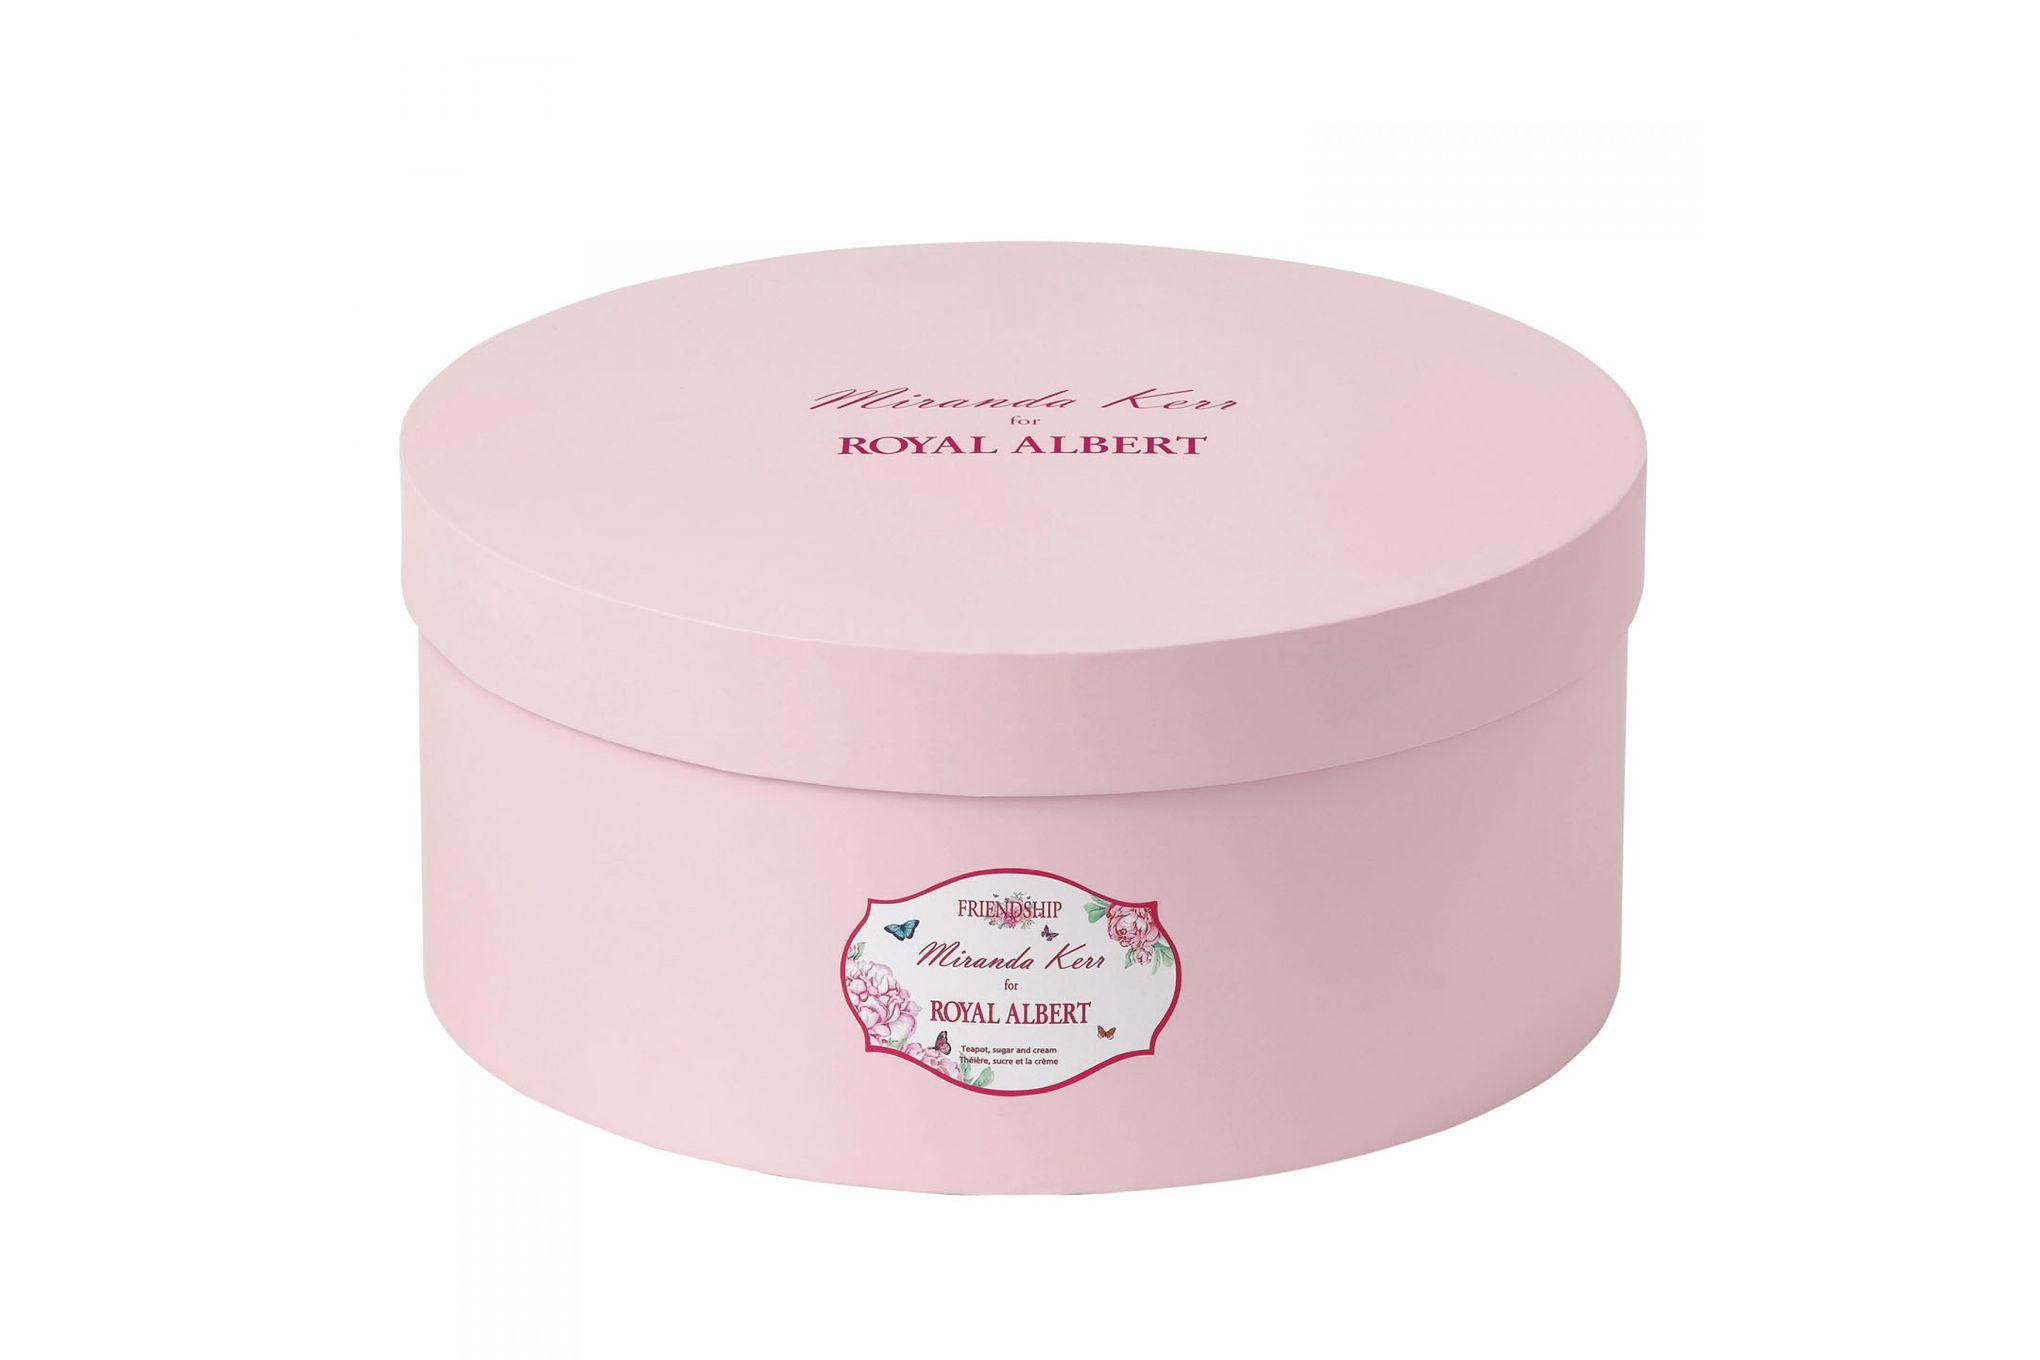 Miranda Kerr for Royal Albert Friendship 3 Piece Tea set Teapot, Sugar and Cream thumb 2